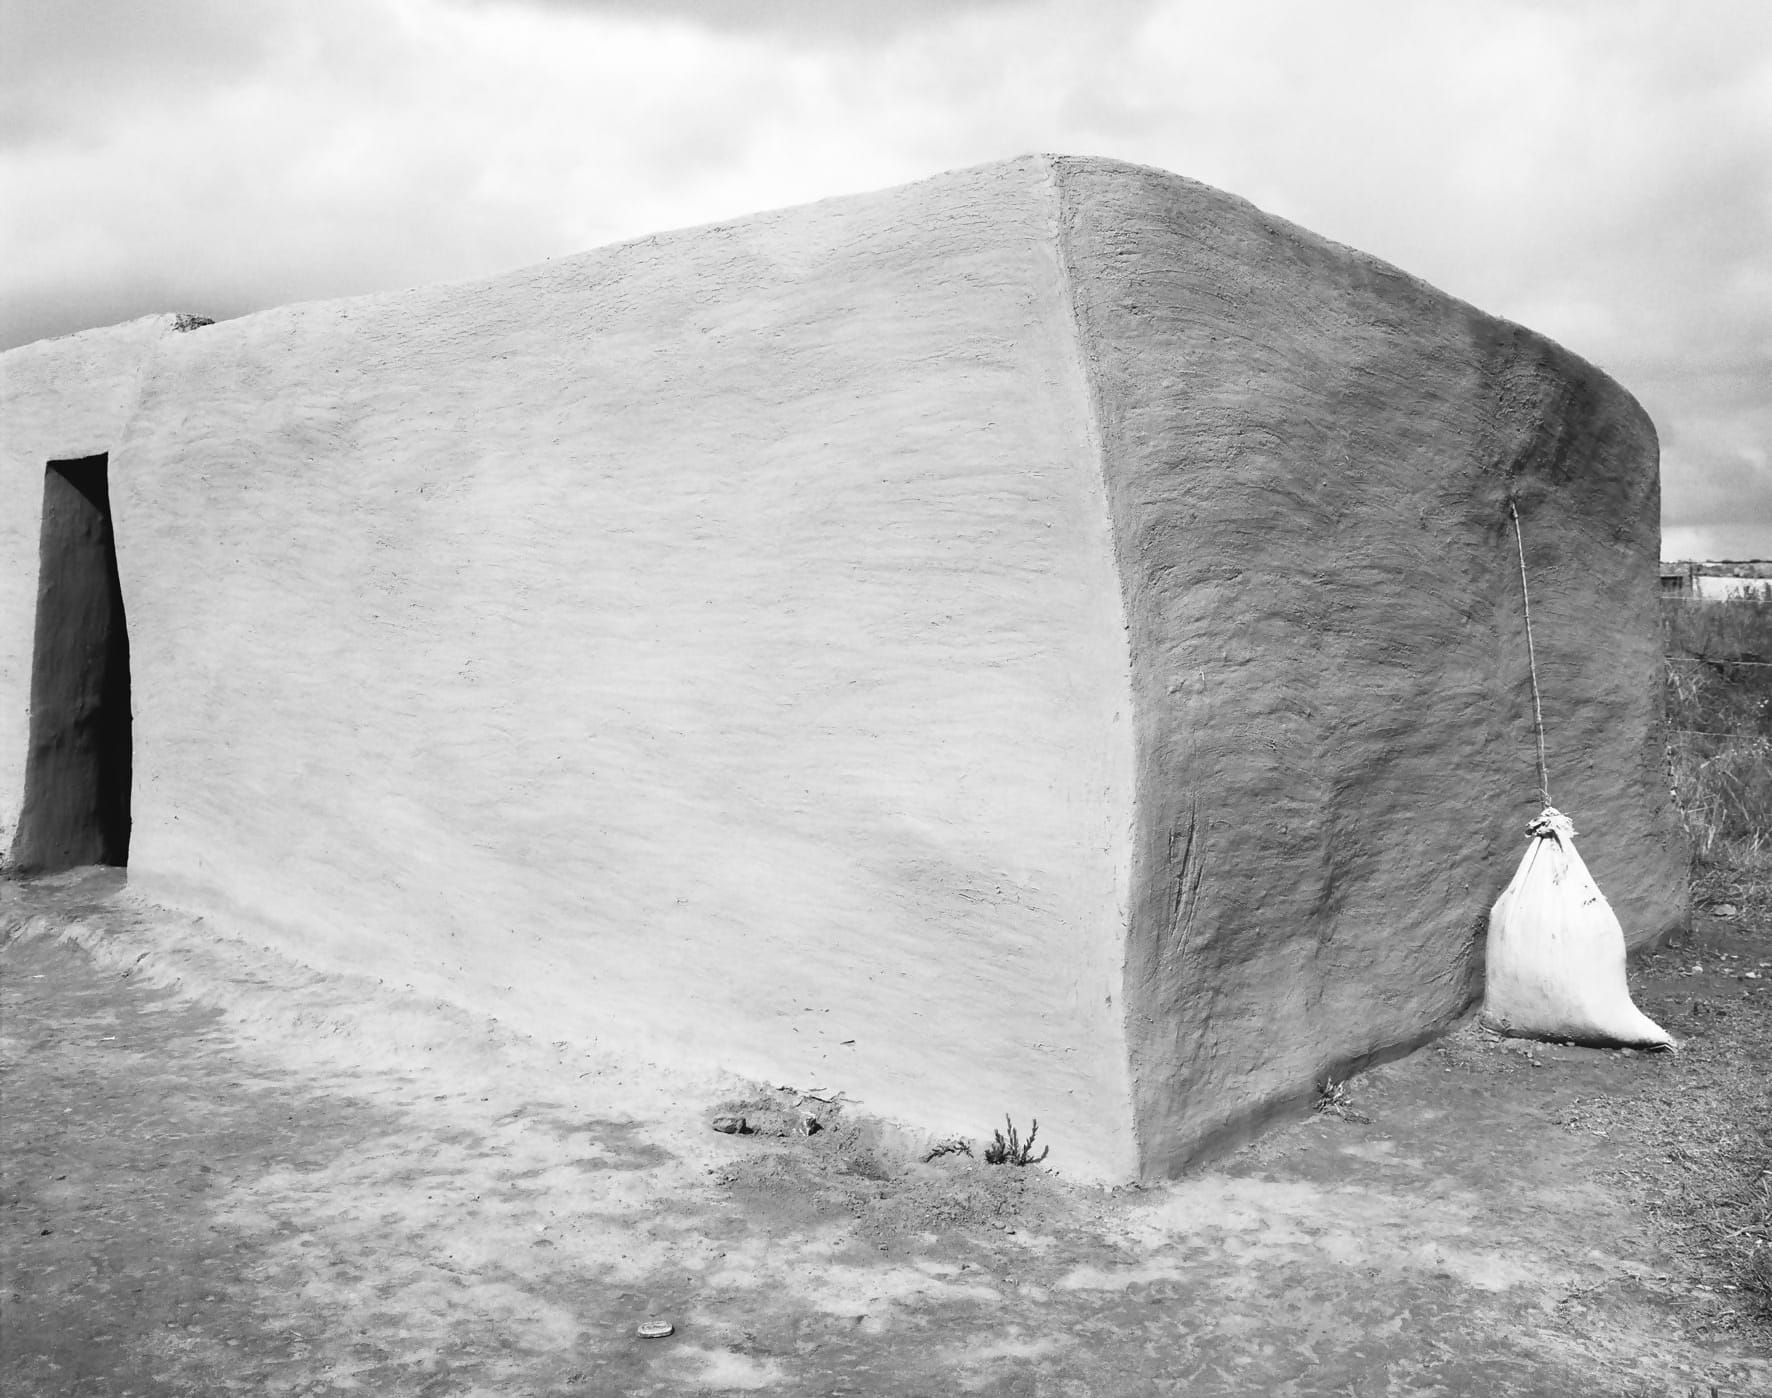 Structures: House near Phuthaditjhaba. QwaQwa. 1 May 1989 by David Goldblatt